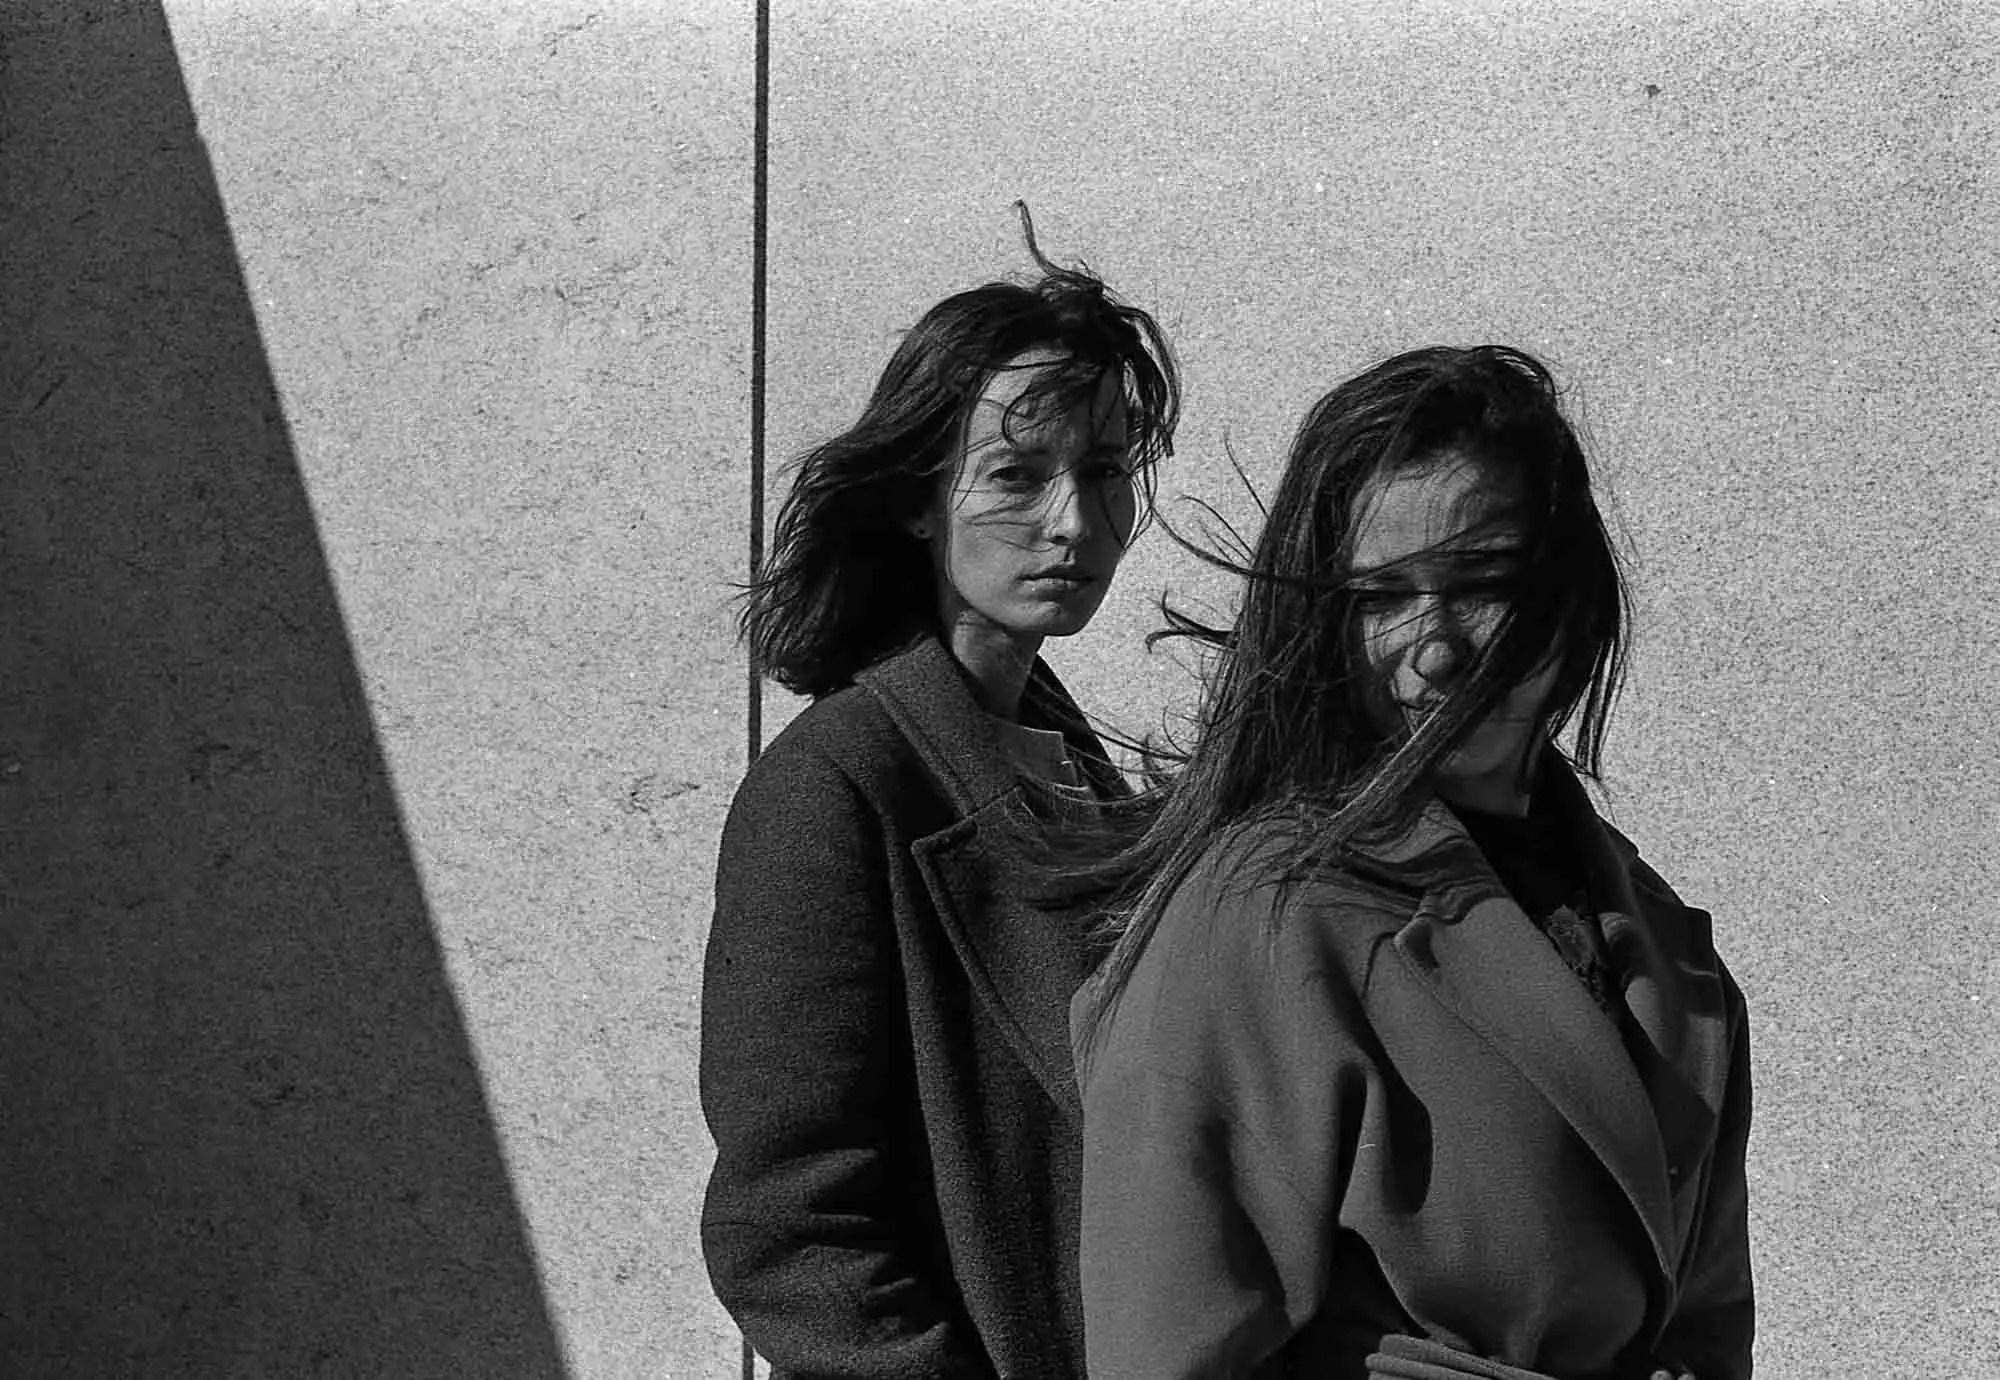 5 Frames With... Kentmere 400 (EI 800 / 35mm / Nikon F4S) - by Denys Trofimchuk